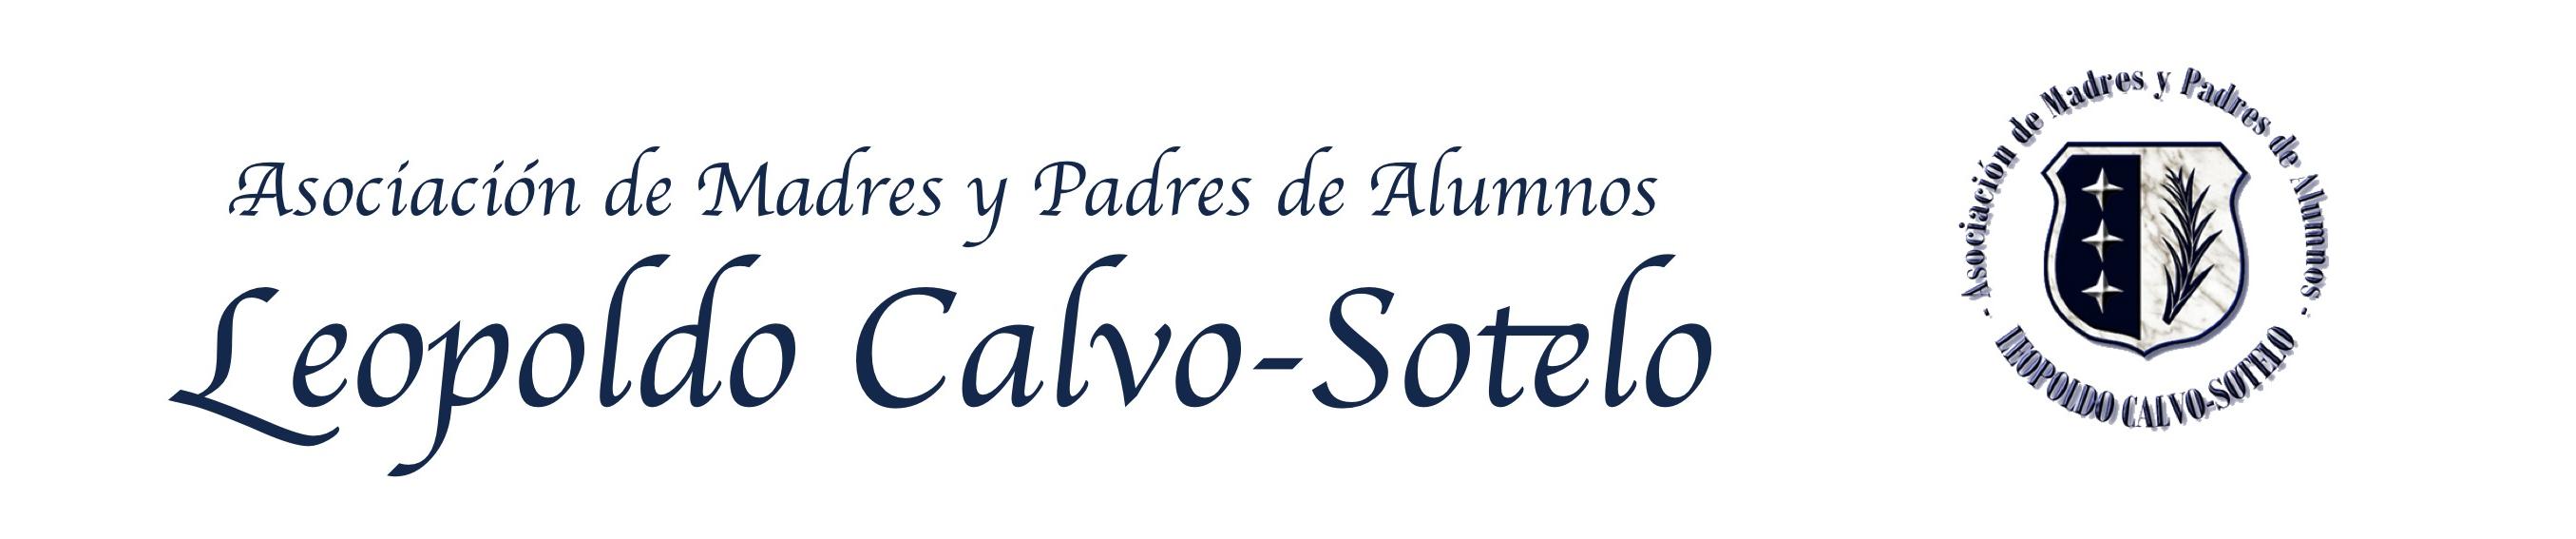 AMPA Leopoldo Calvo-Sotelo